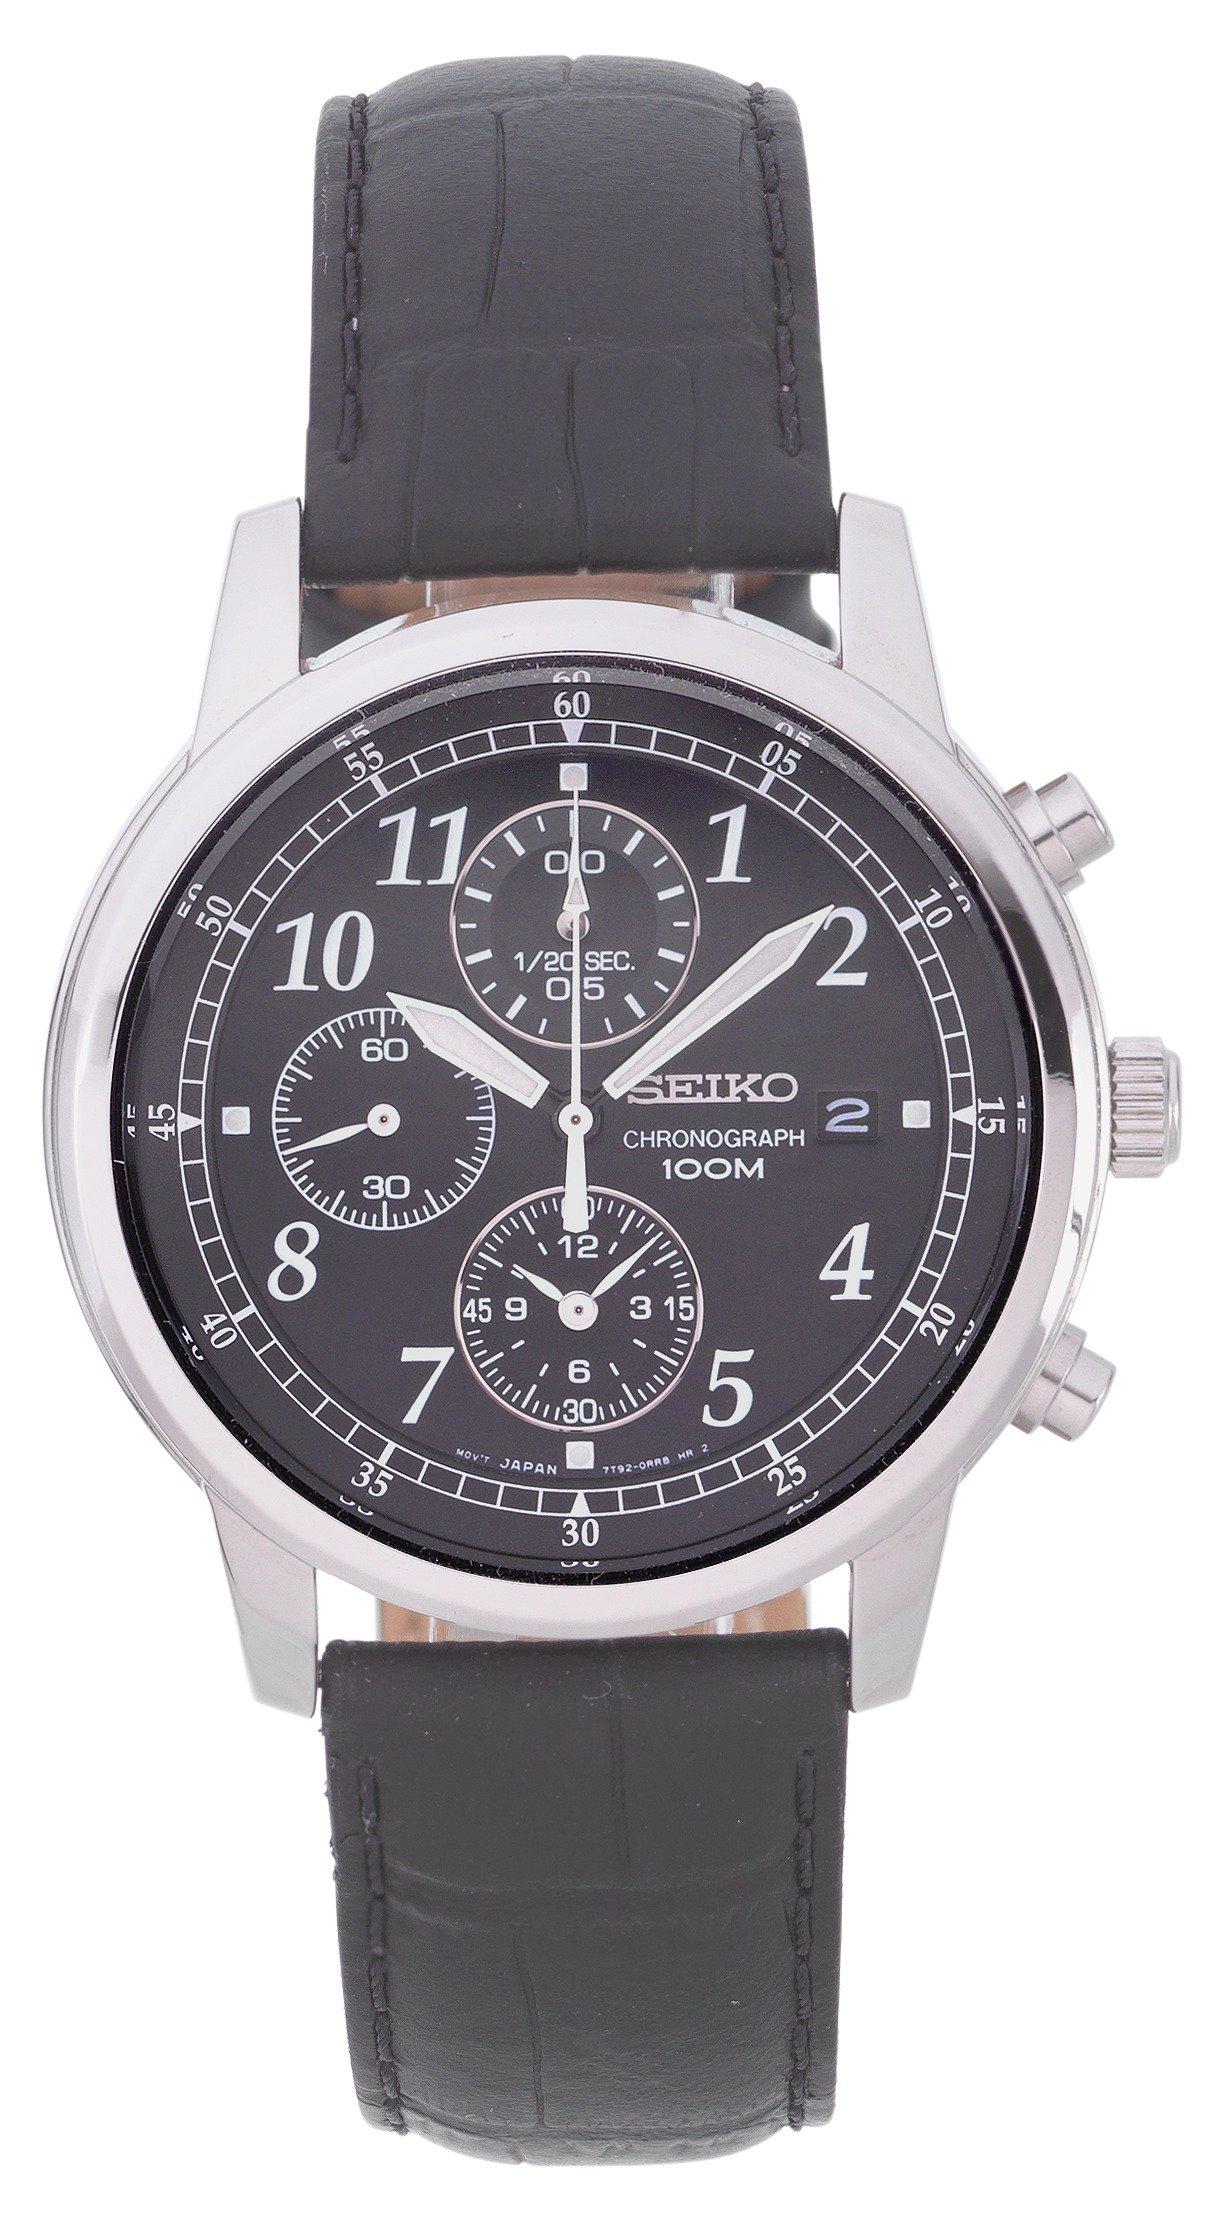 Seiko Men's Black Leather Strap Chronograph Watch